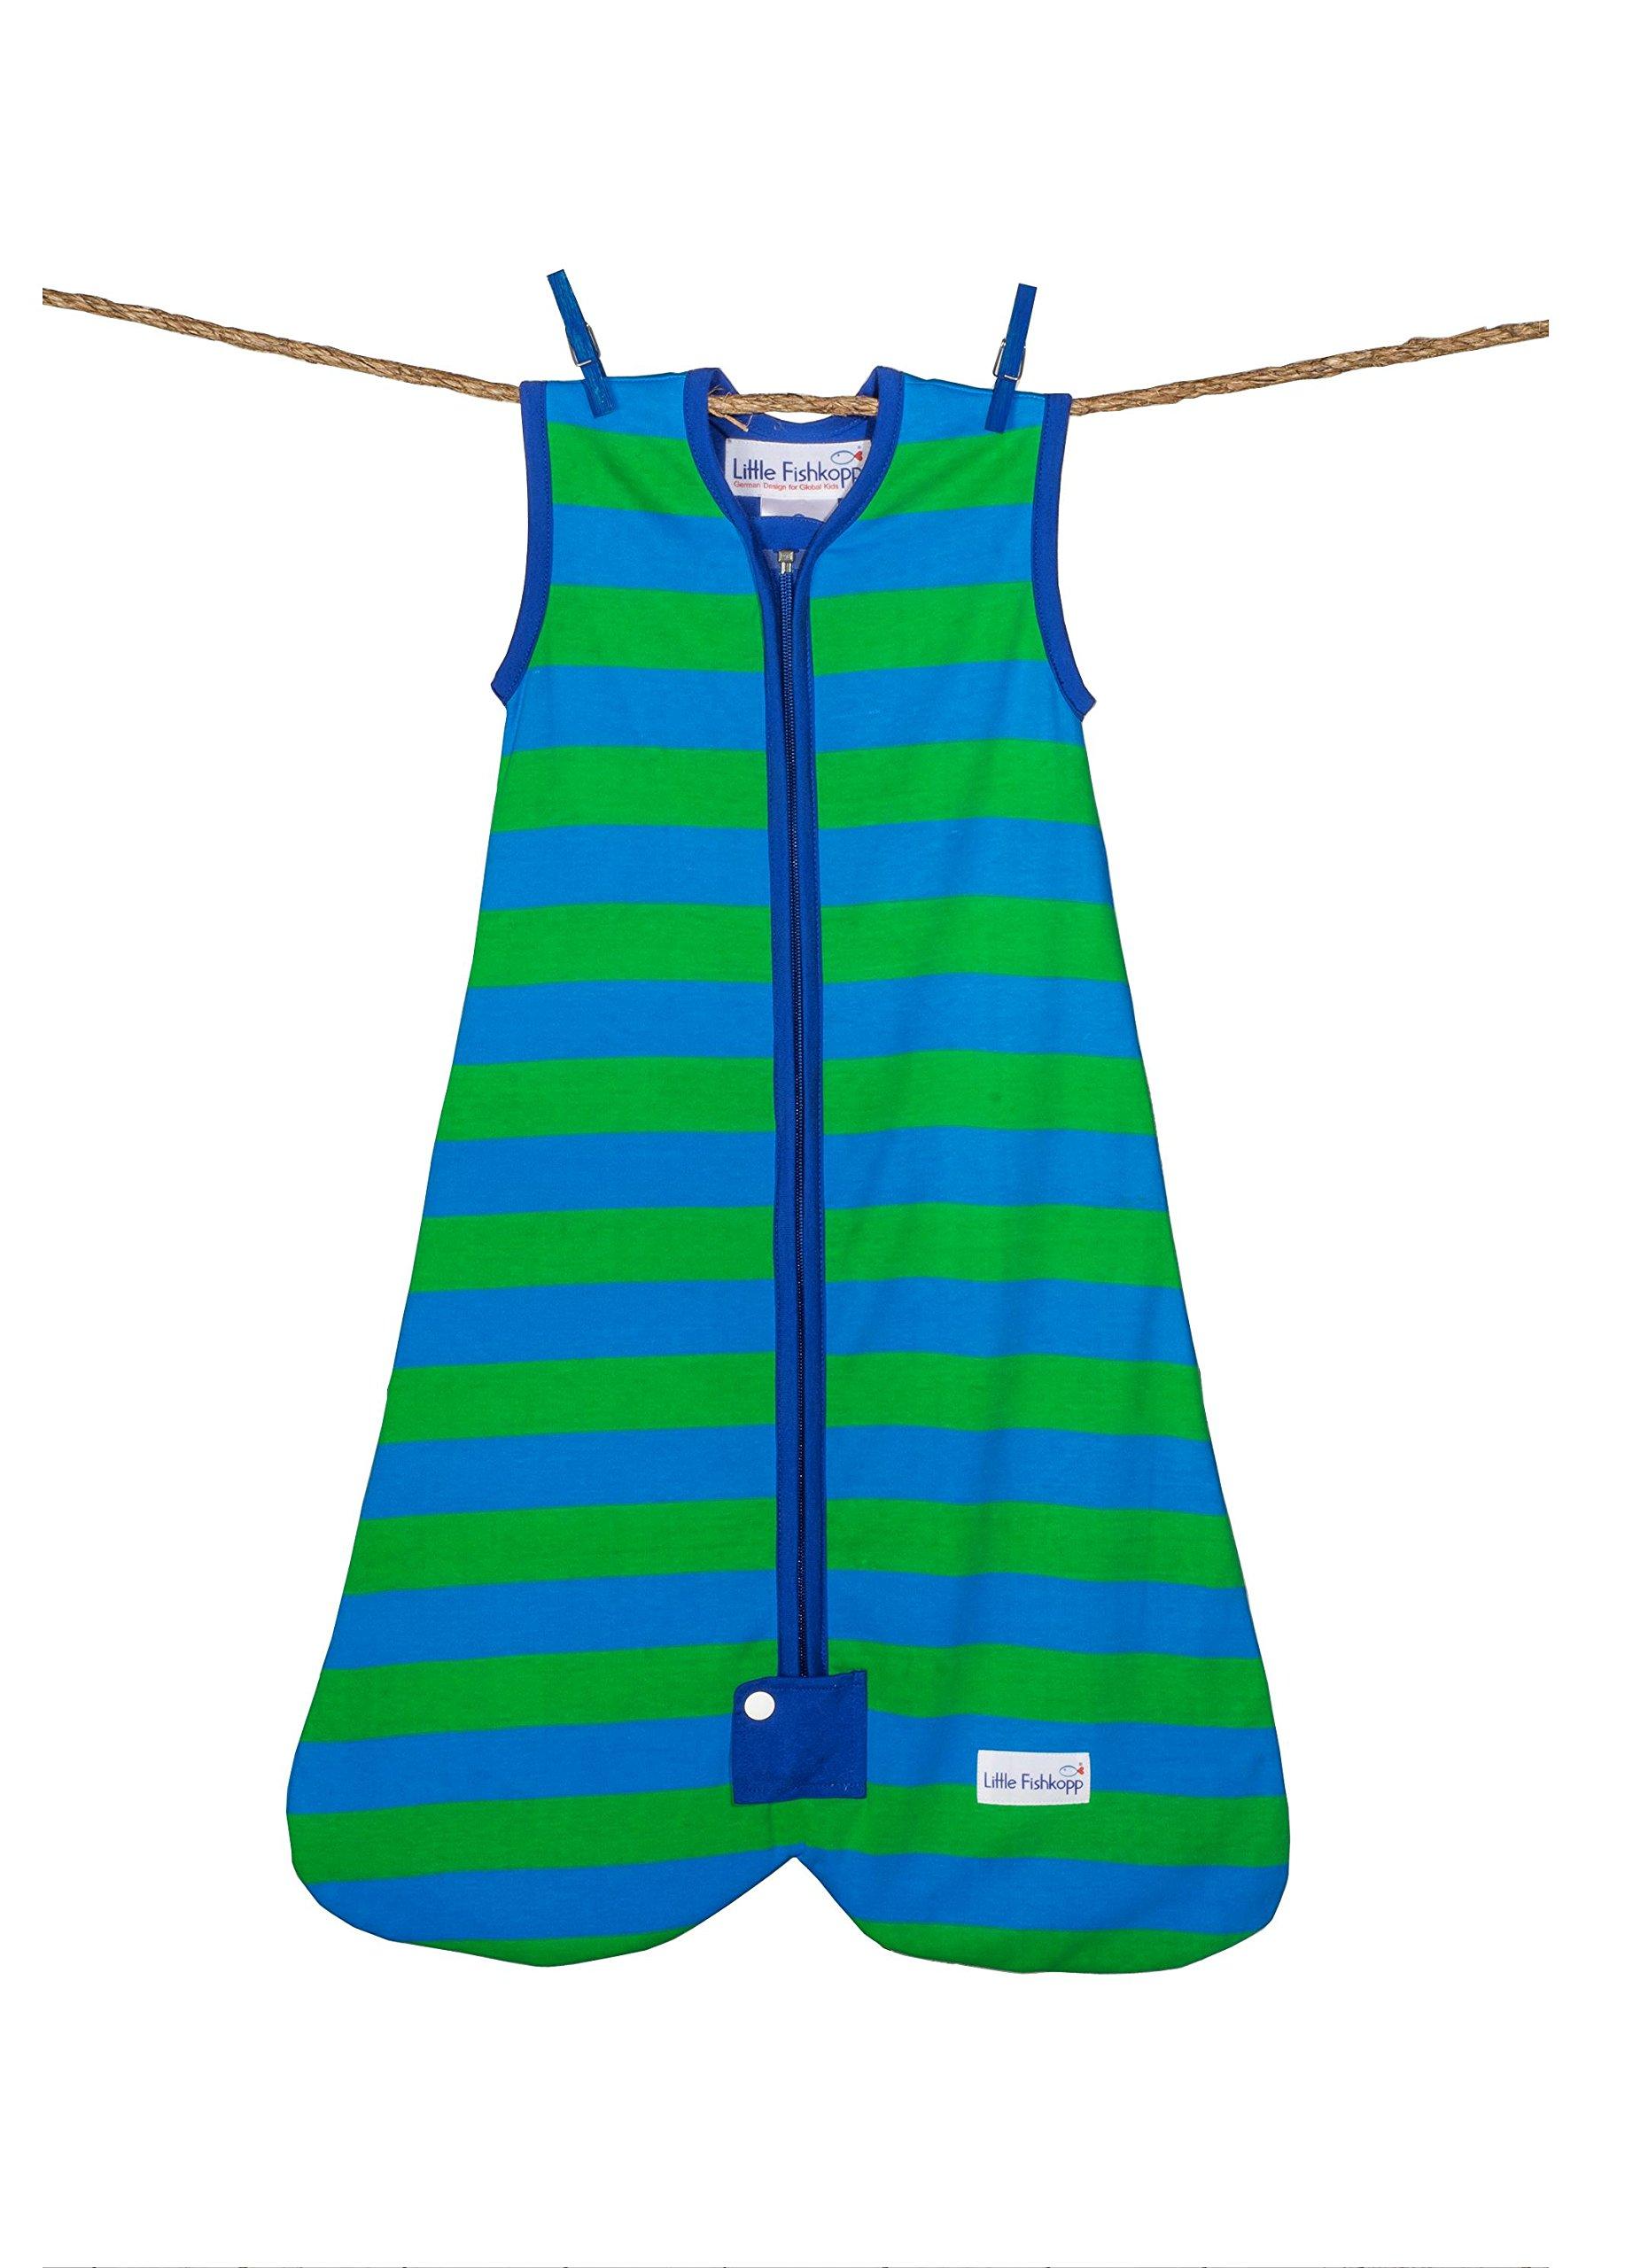 Little Fishkopp Organic Cotton Baby Sleep Bag, Stripes, 1.0 Tog, Green/Blue, Medium